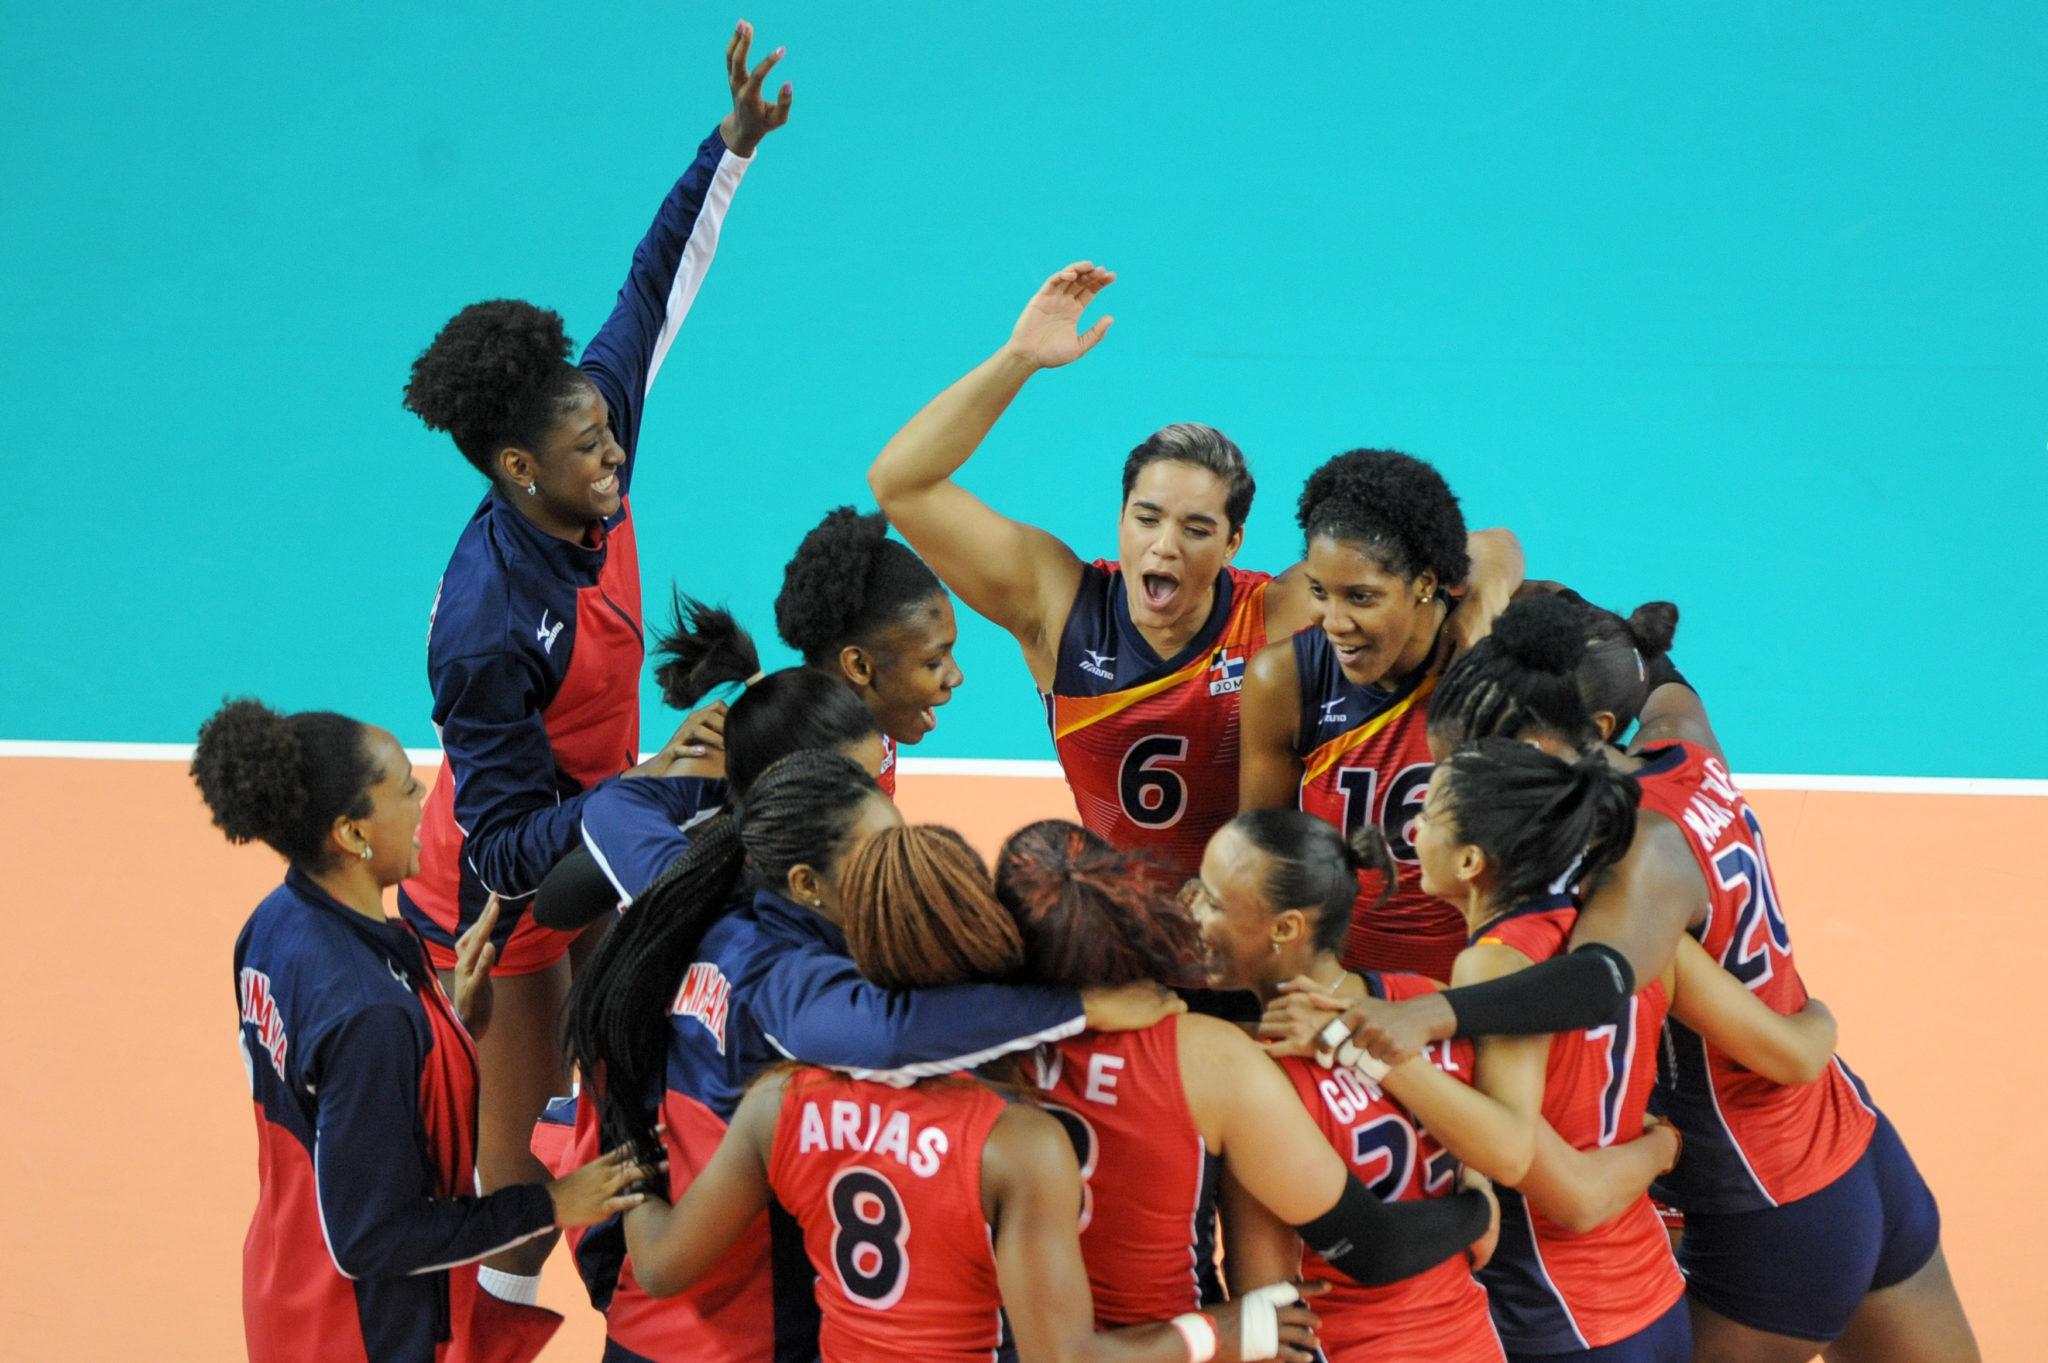 Match com dominican republic